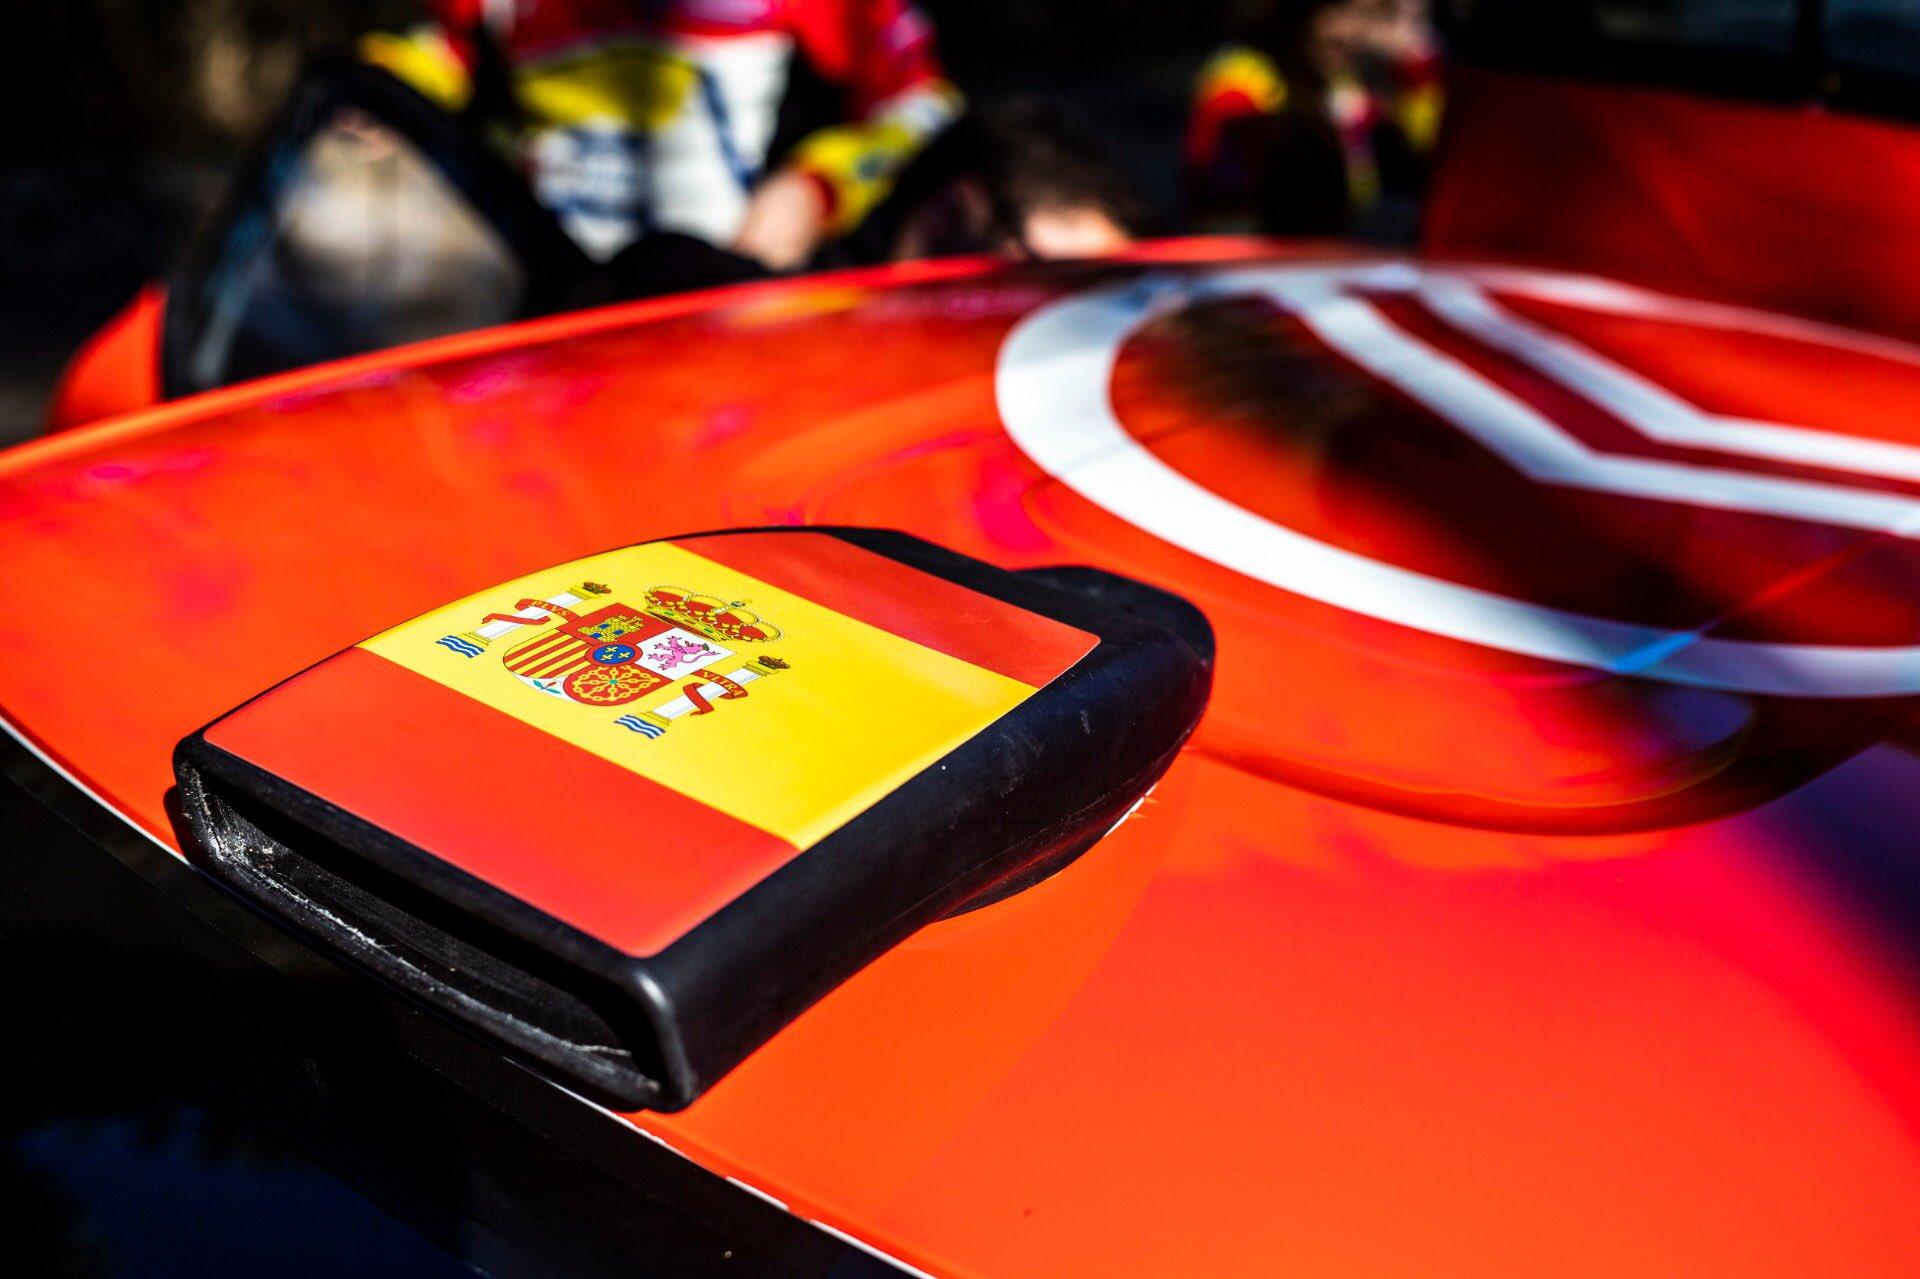 FIA European Rally Championship: Temporada 2020 - Página 4 ES1-pB0XsAAnvkm?format=jpg&name=large